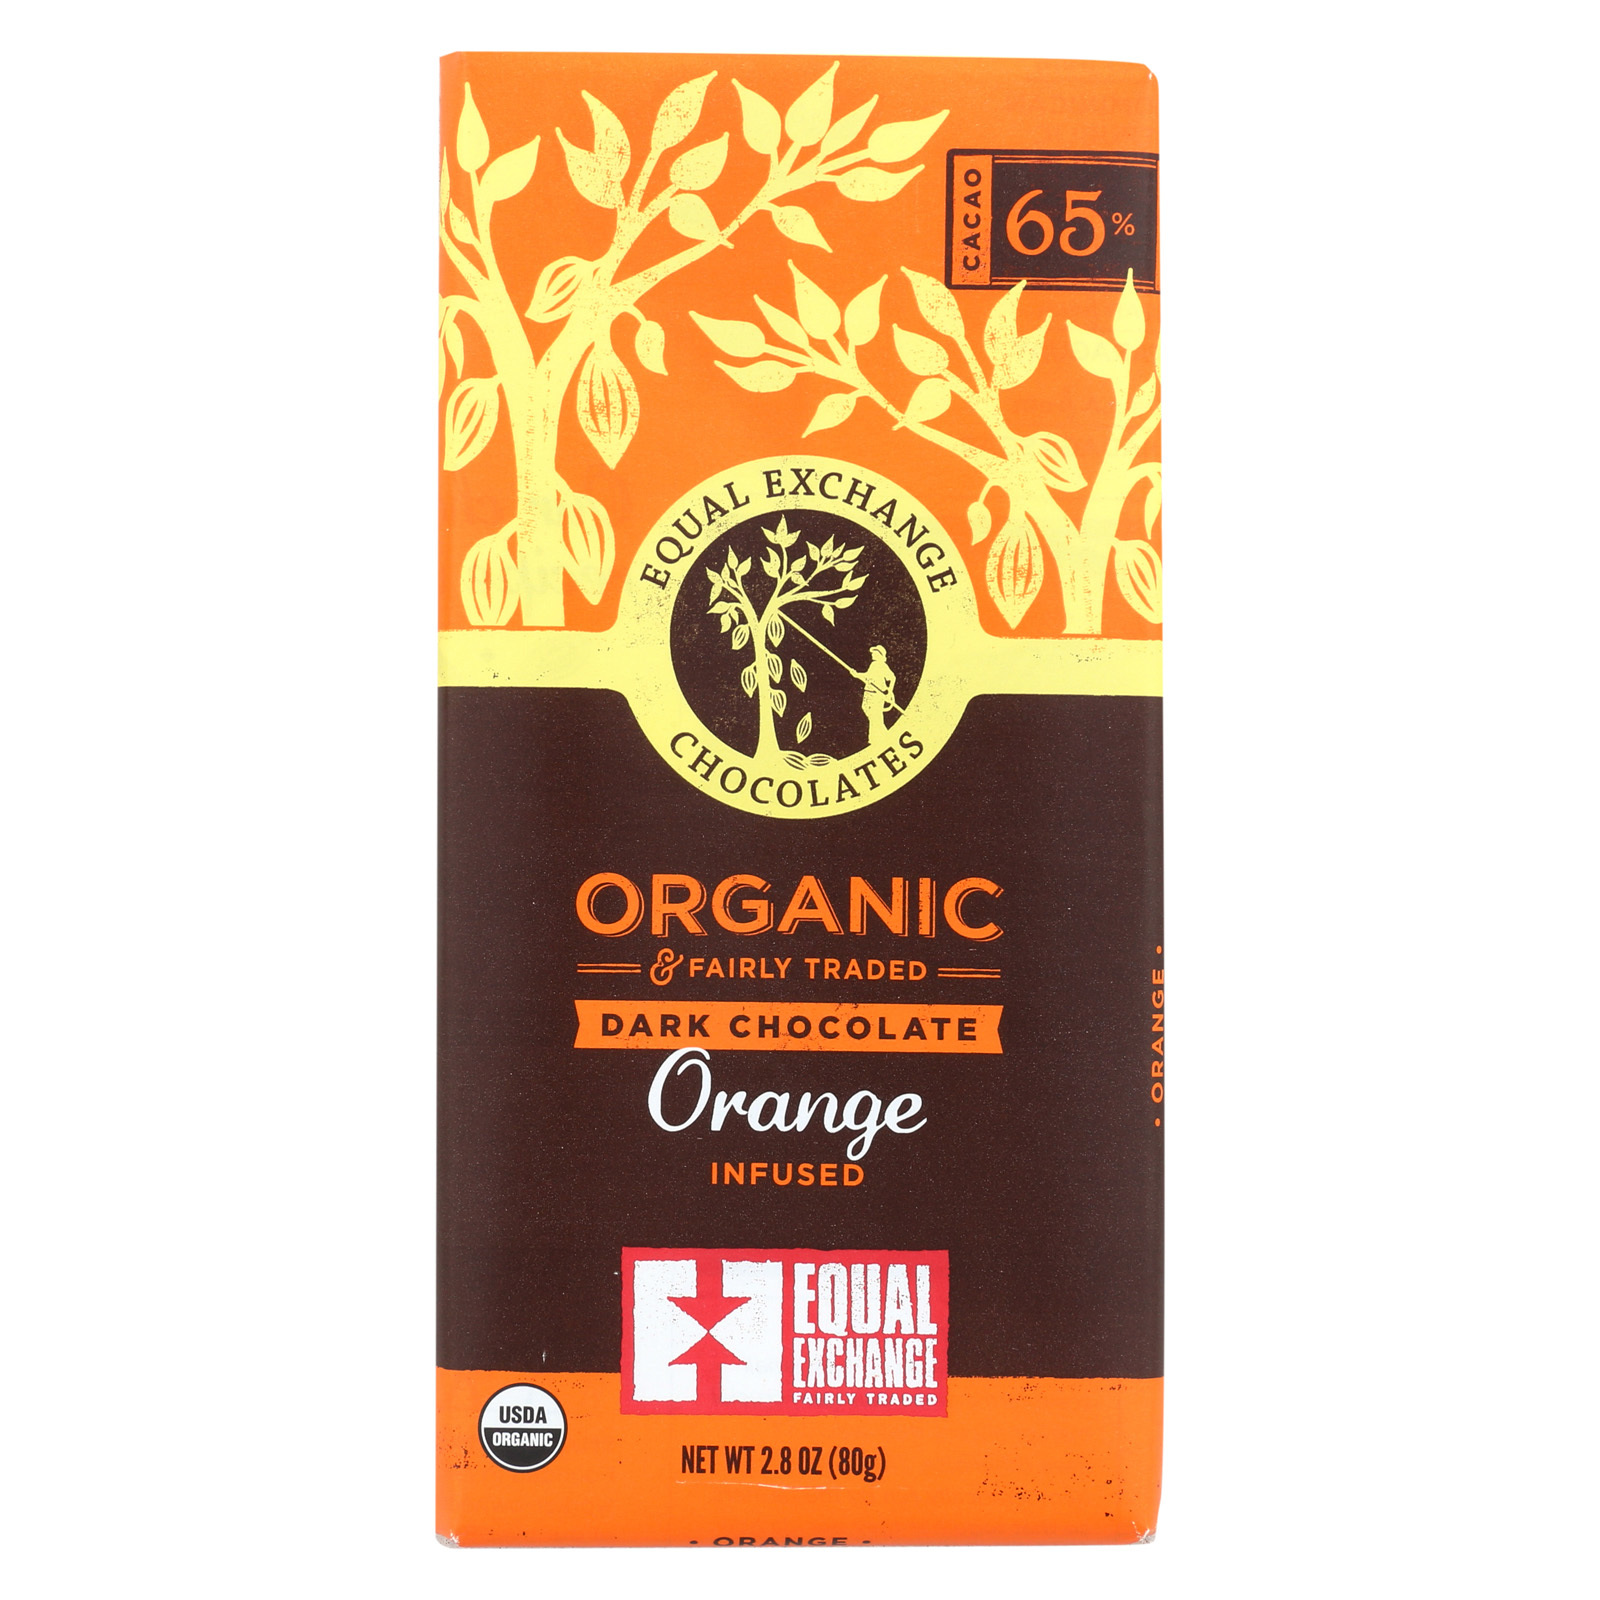 Equal Exchange Organic Orange Chocolate - Orange - Case of 12 - 2.8 oz.